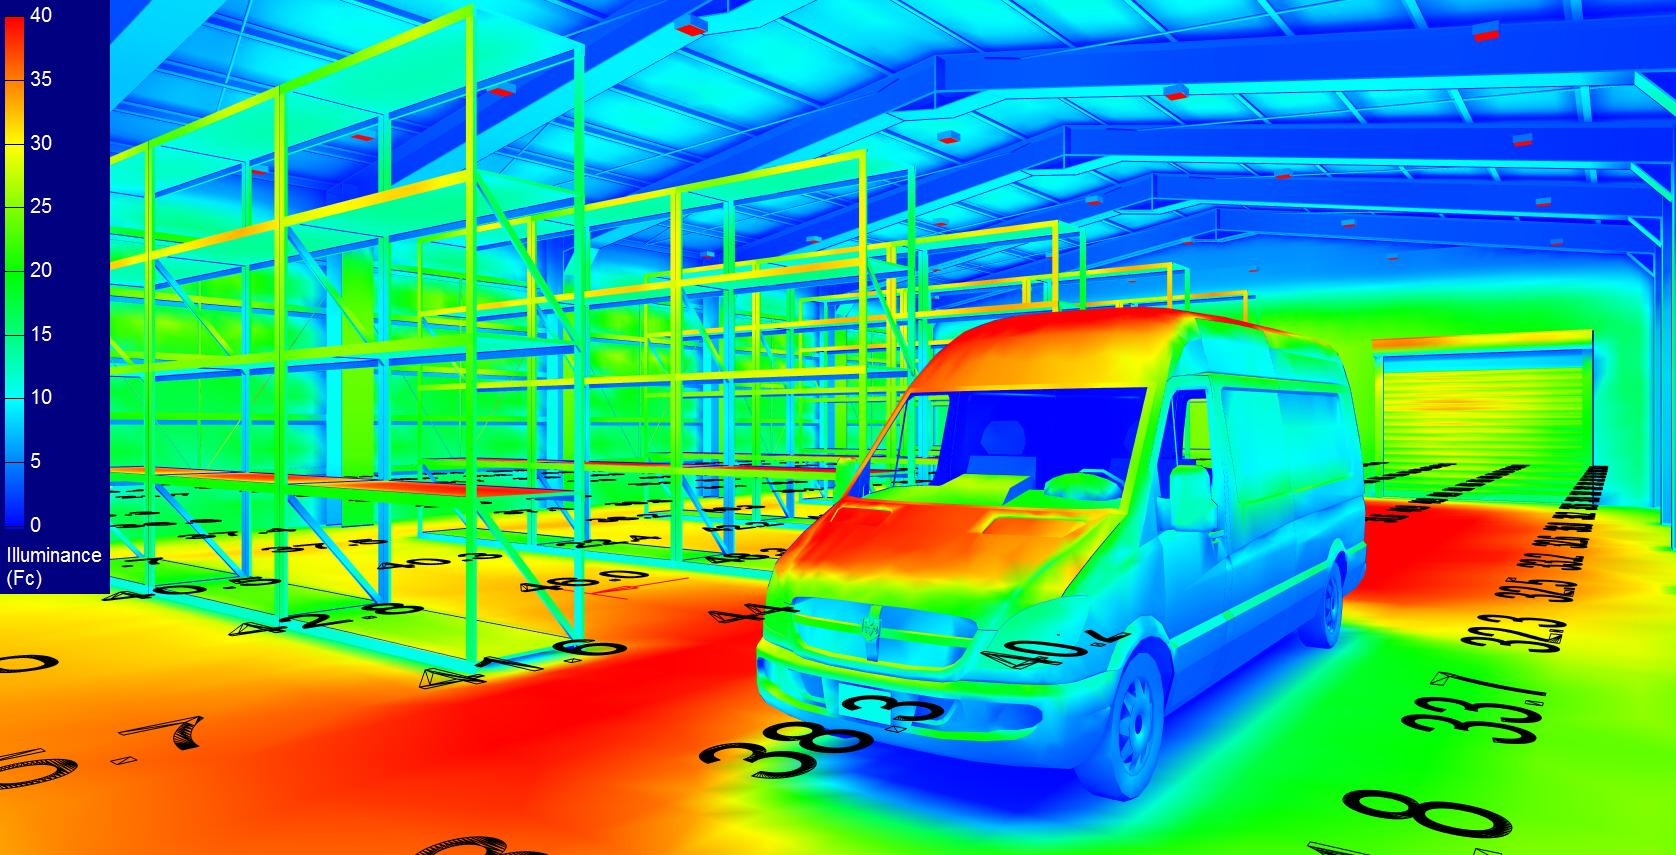 OHG Industrial Bldg Example 40FC RGB Render V1